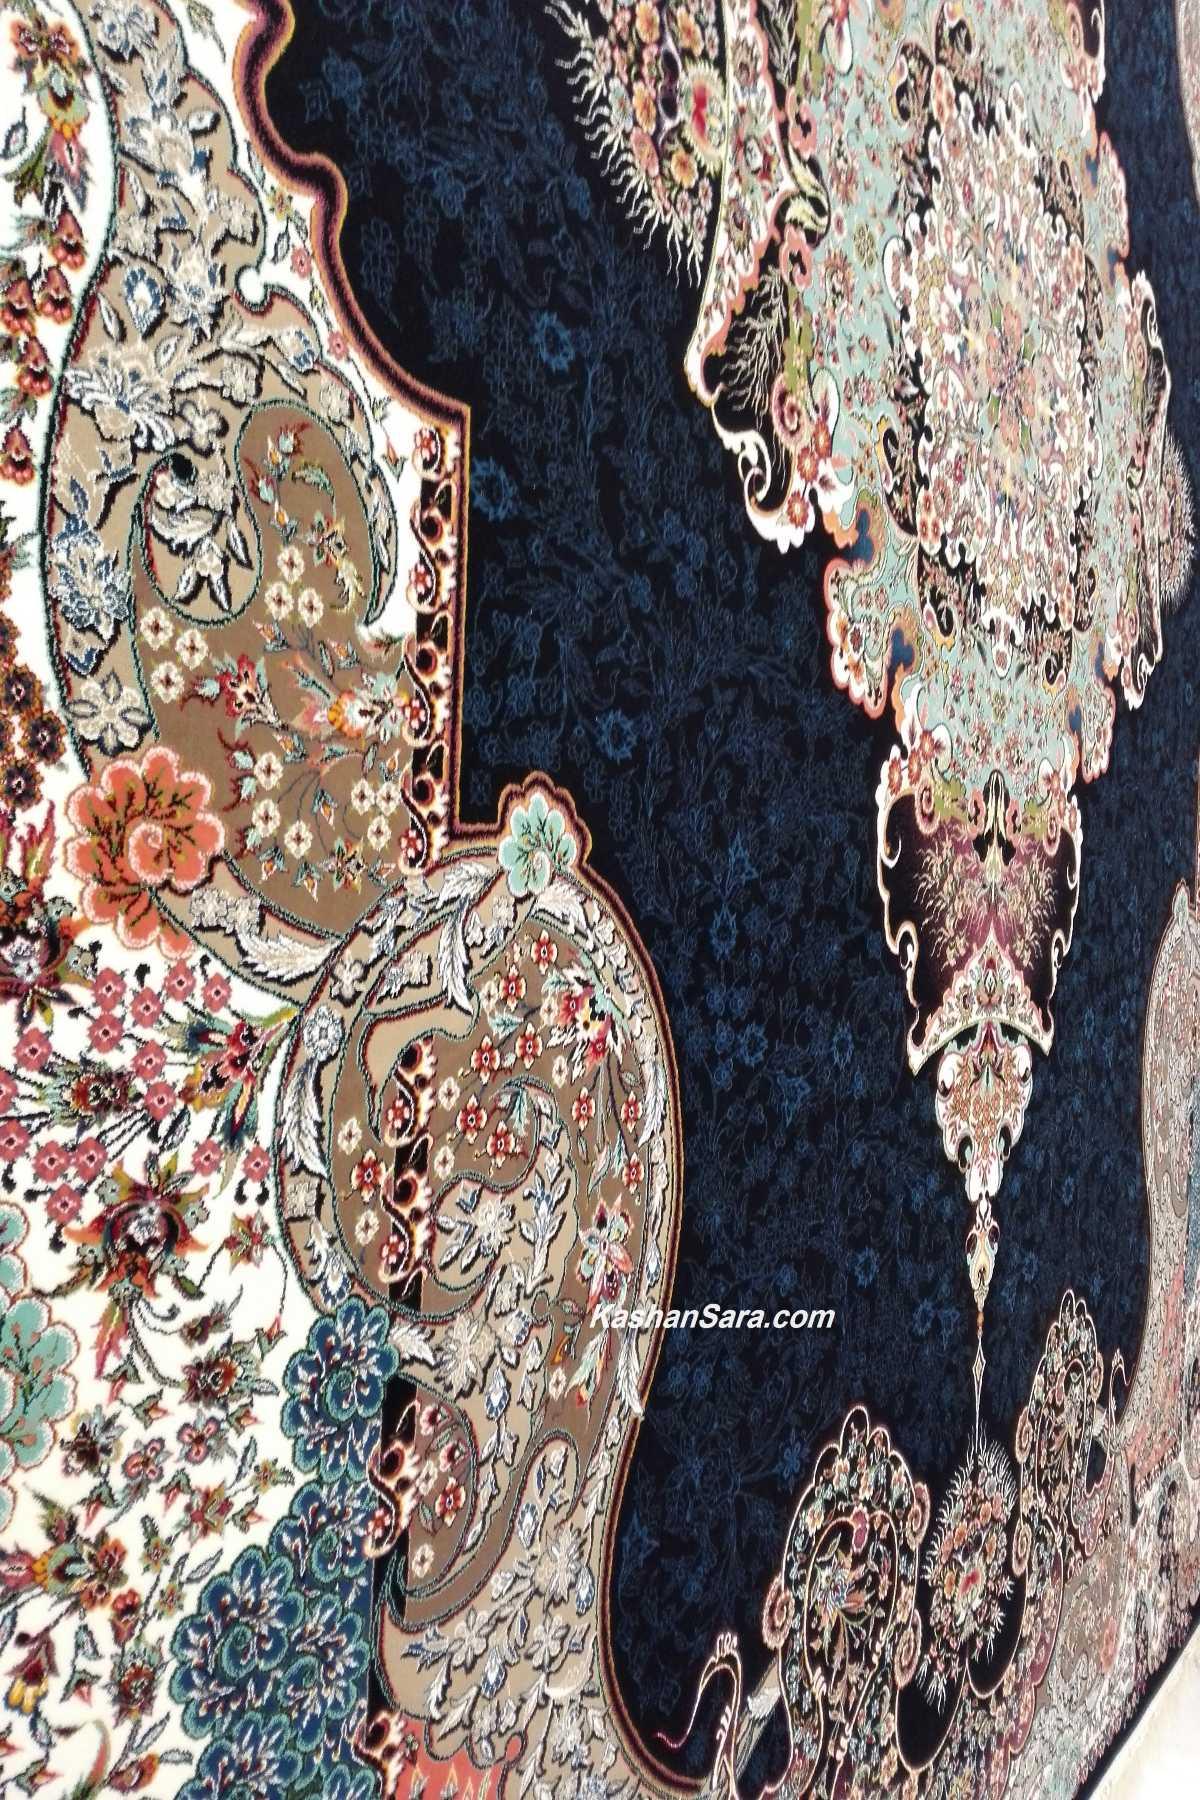 فرش ۷۰۰ شانه کاشان تراکم ۲۵۵۰ نقشه الی